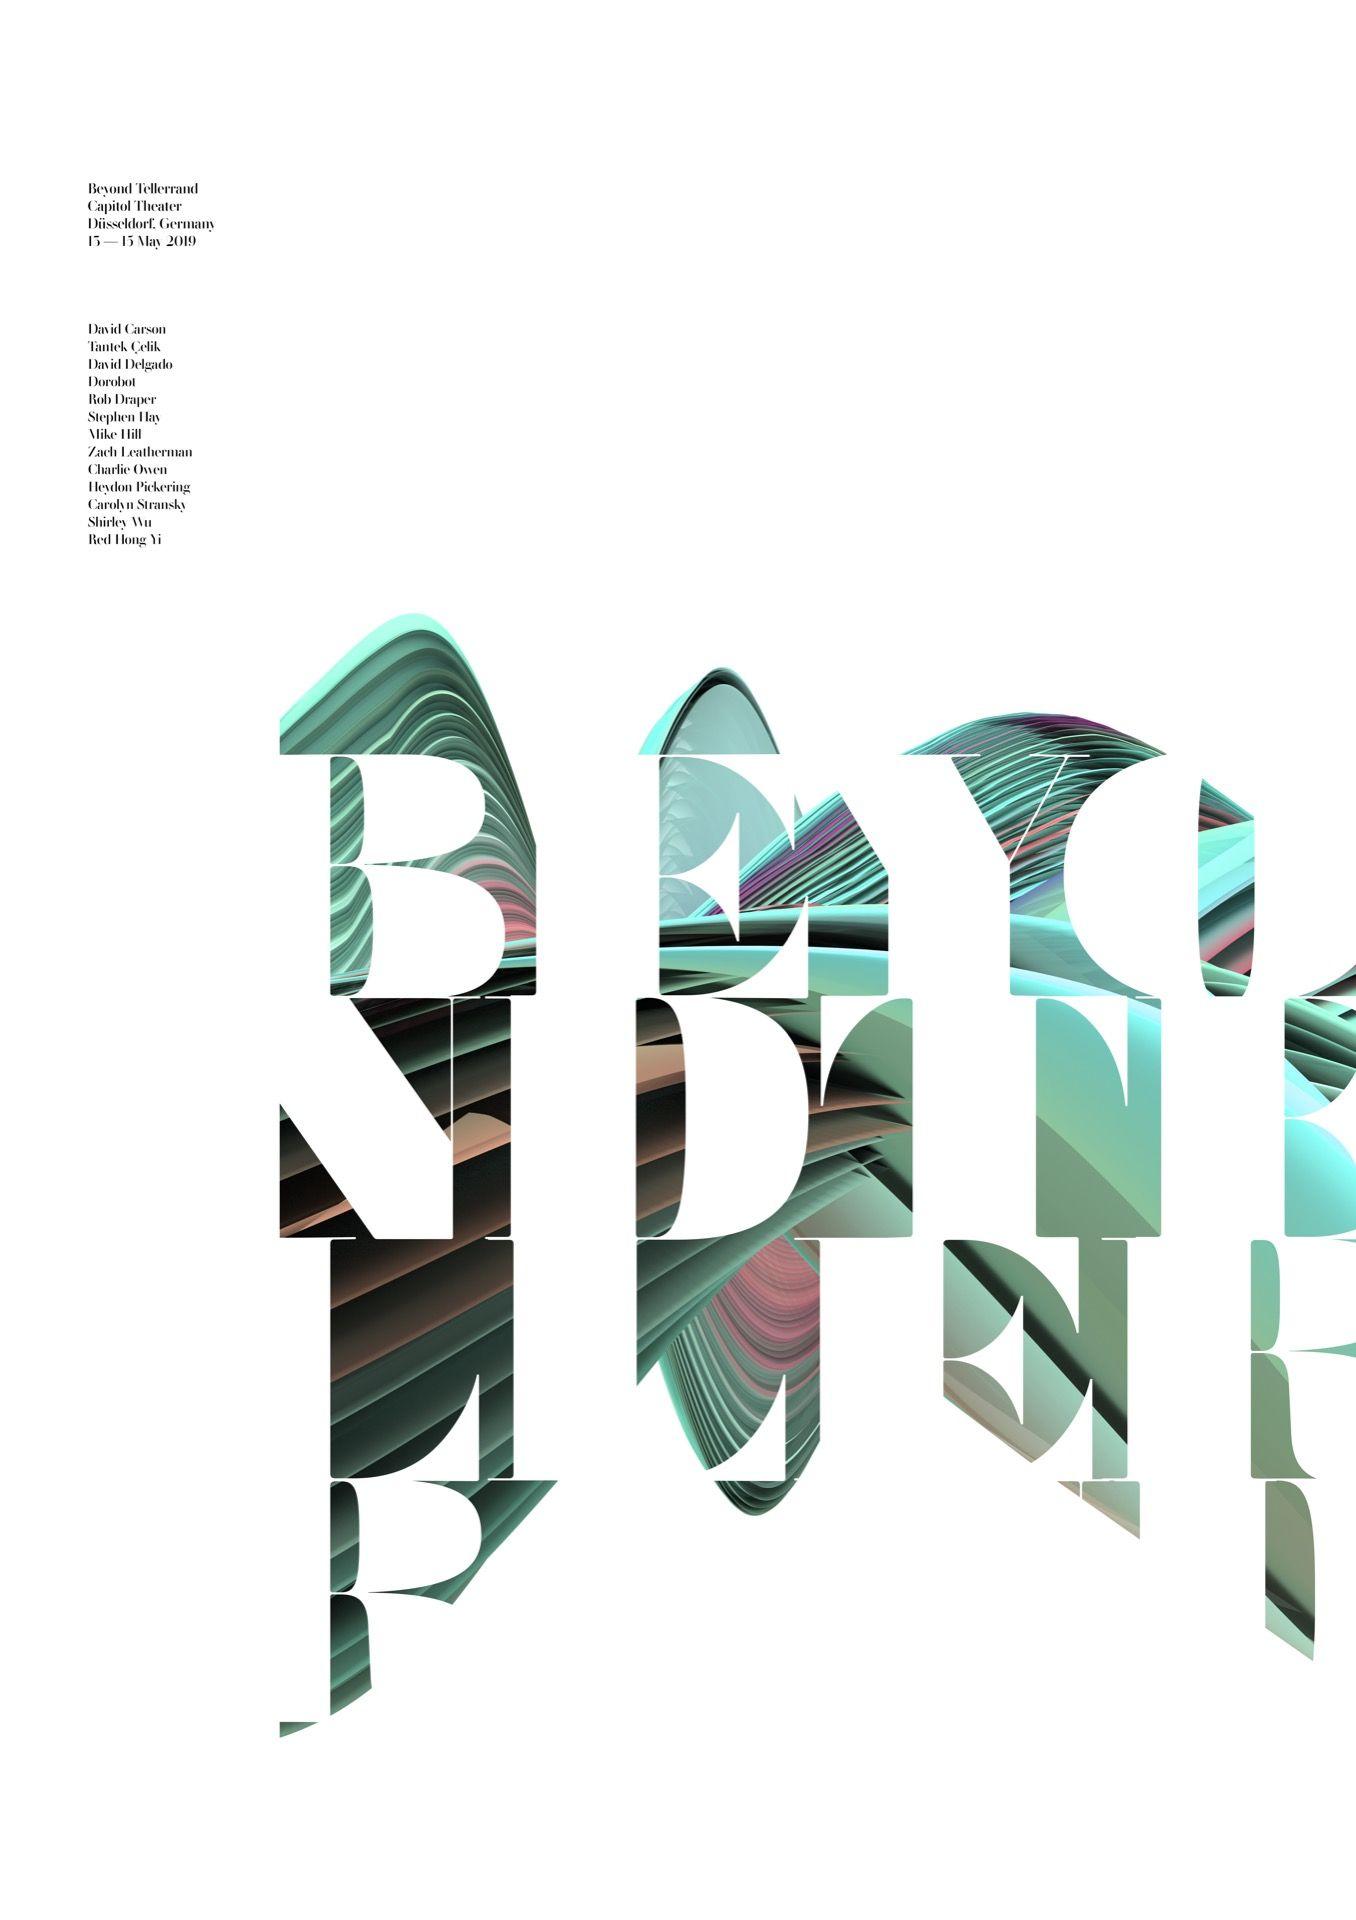 beyondtellerrand-2019-poster-bt_1_1356x1920-f43a9f877b35aa86635ea4e2b2253132